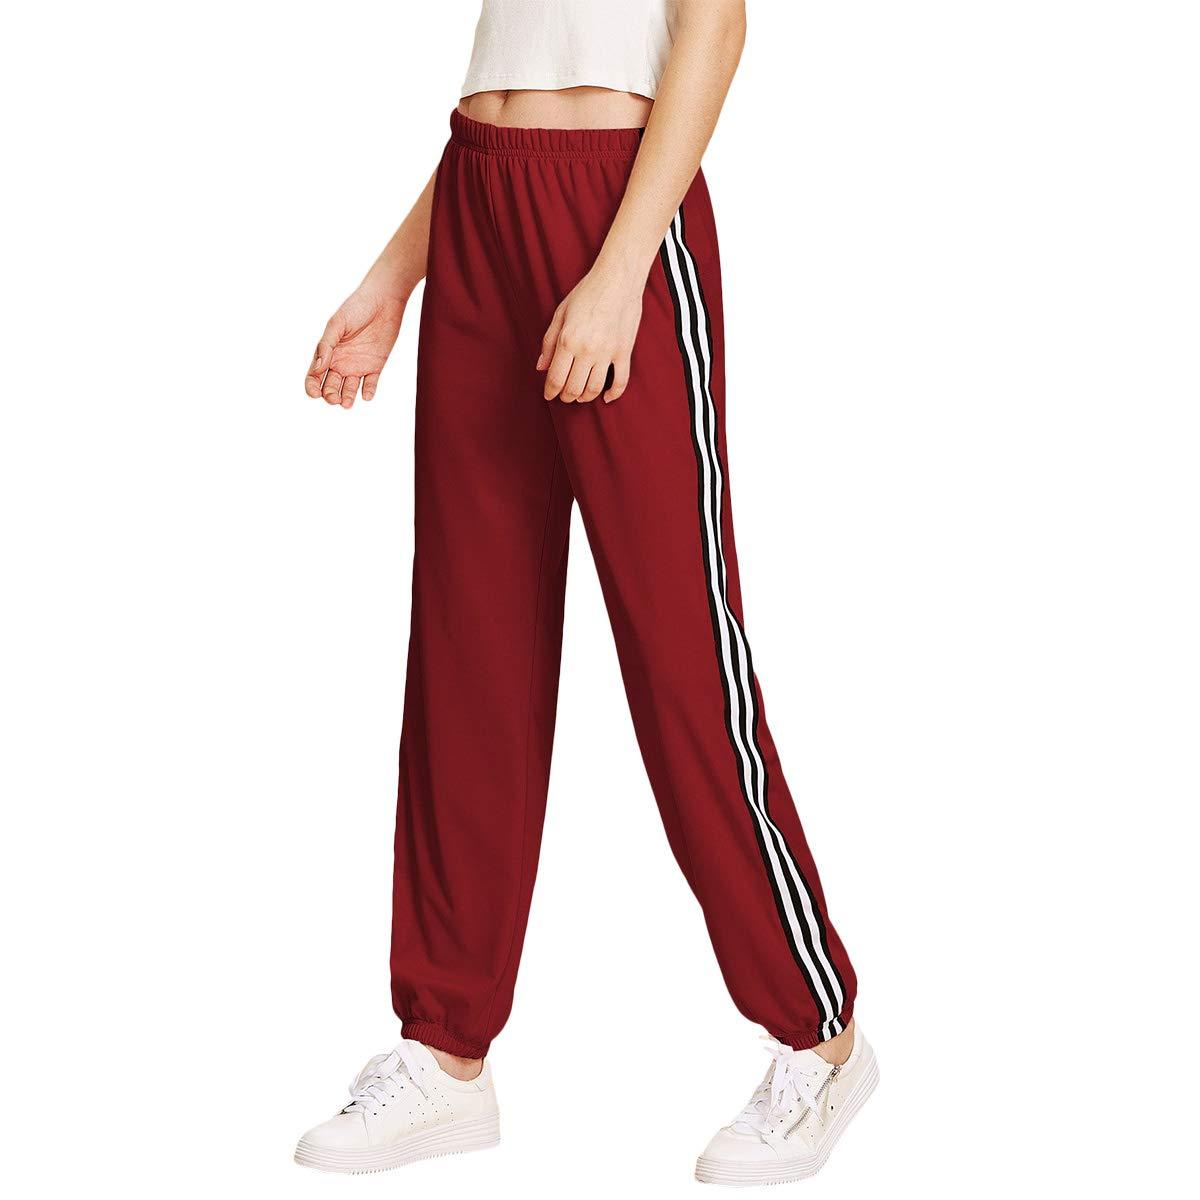 SOLY HUX Damen Hosen Sporthose Sweathose Casual Streifen Elastischer Bund Jogginghose